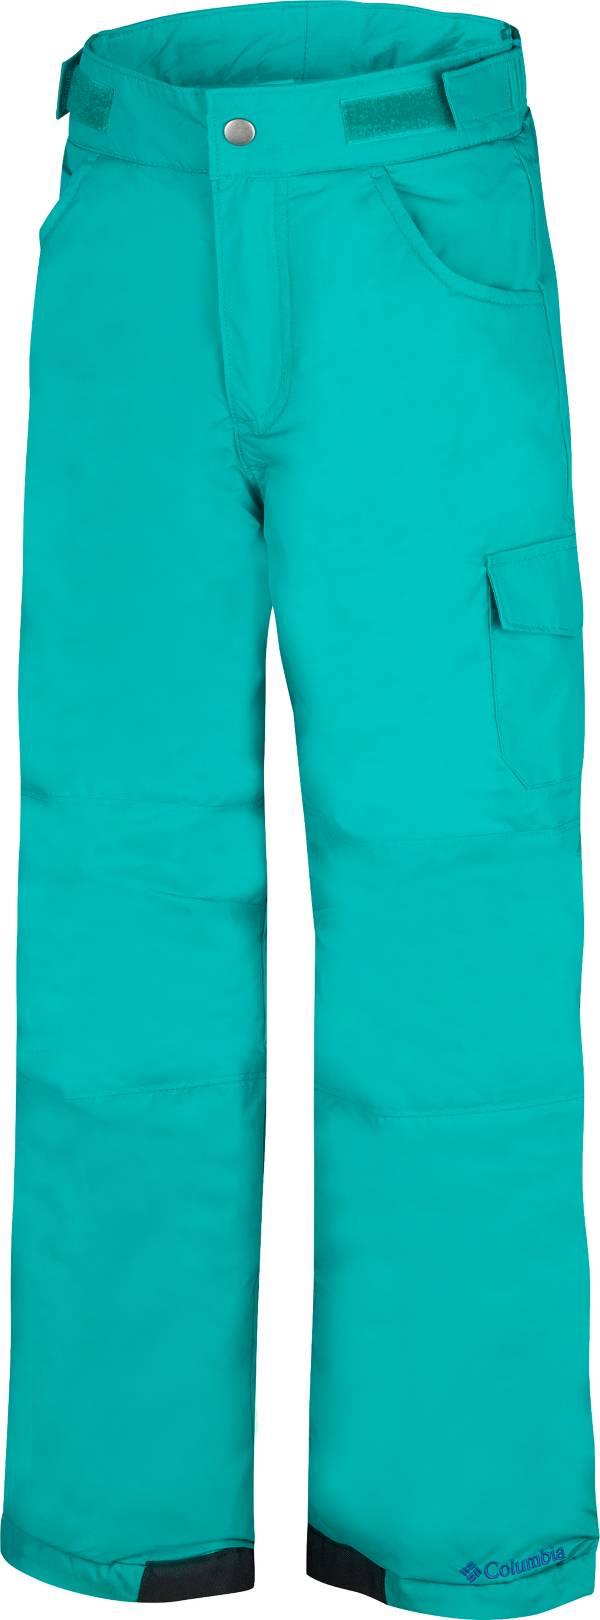 Columbia Toddler Girls' Starchaser Peak II Pants product image